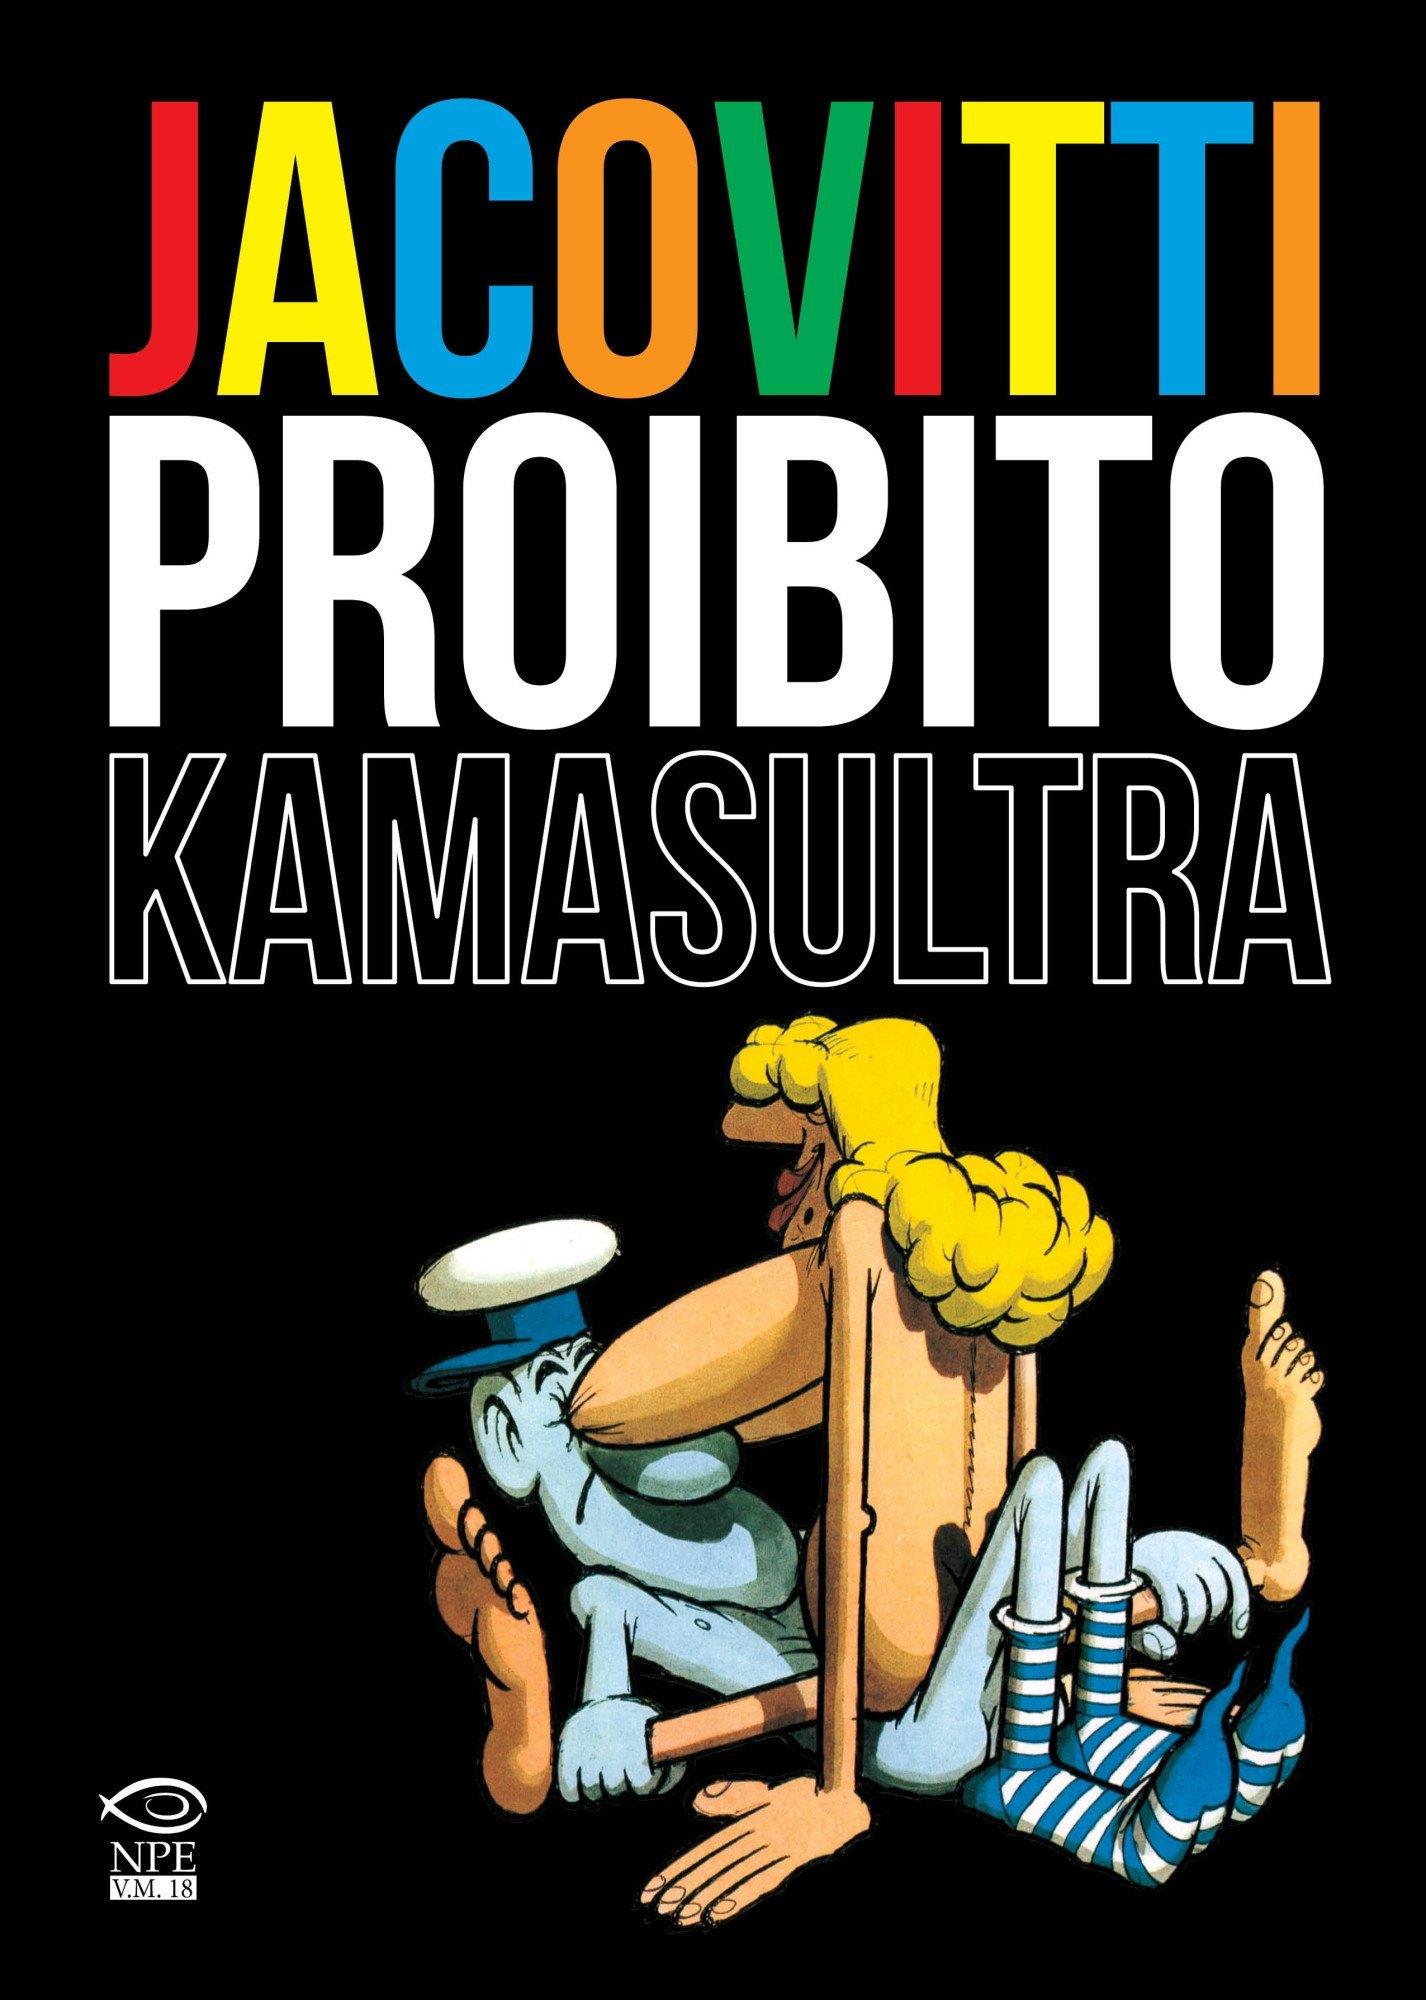 JACOVITTI-PROIBITO-KAMASULTRA-1426x2000_Essential 11